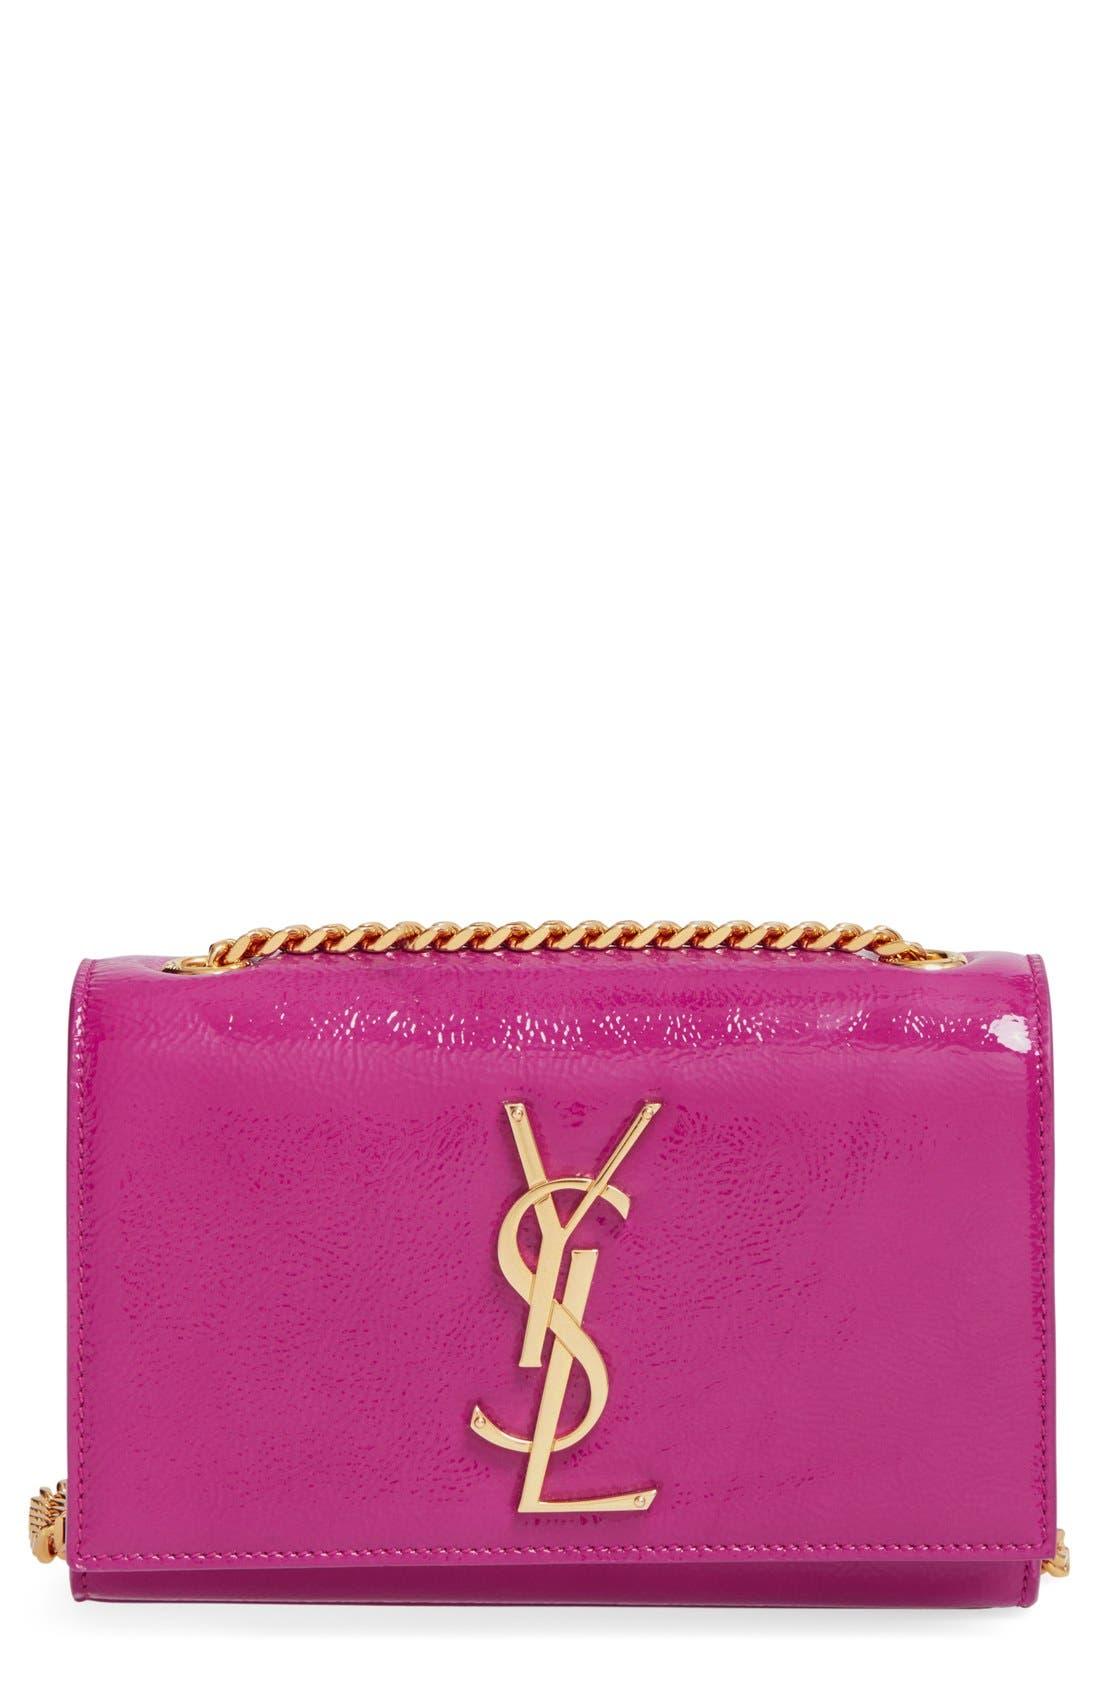 Alternate Image 1 Selected - Saint Laurent 'Mini Monogram Vernis' Handbag